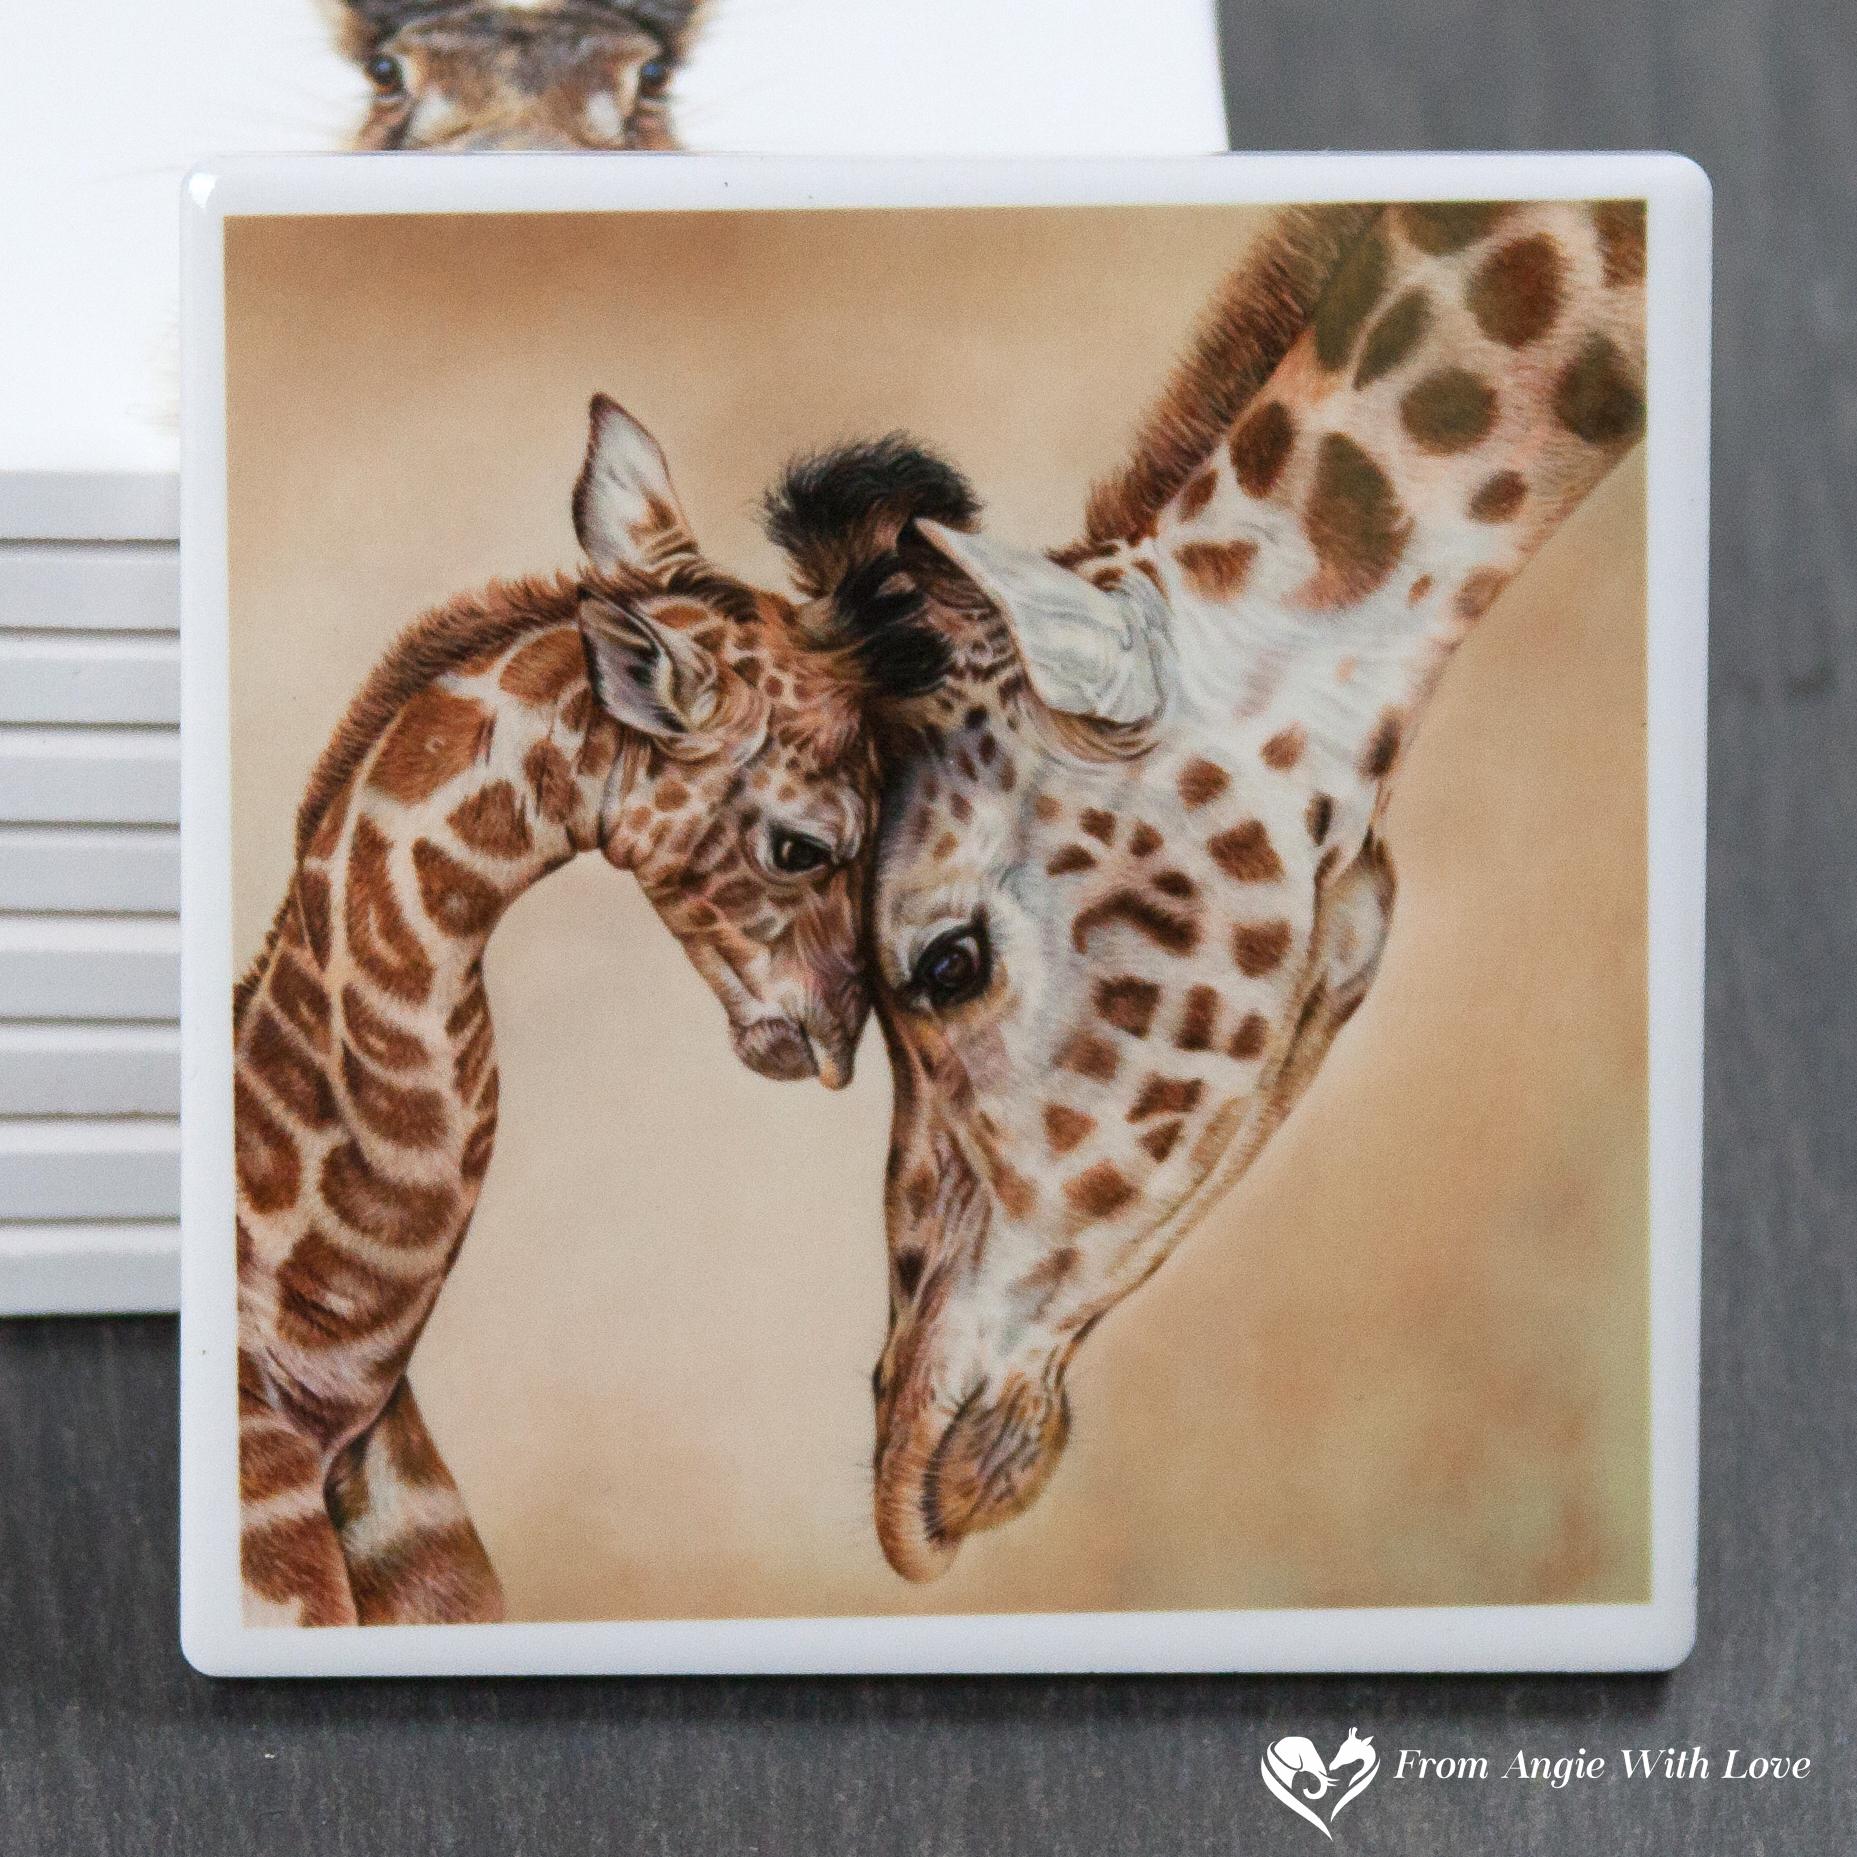 Giraffe Coaster - Tenderness